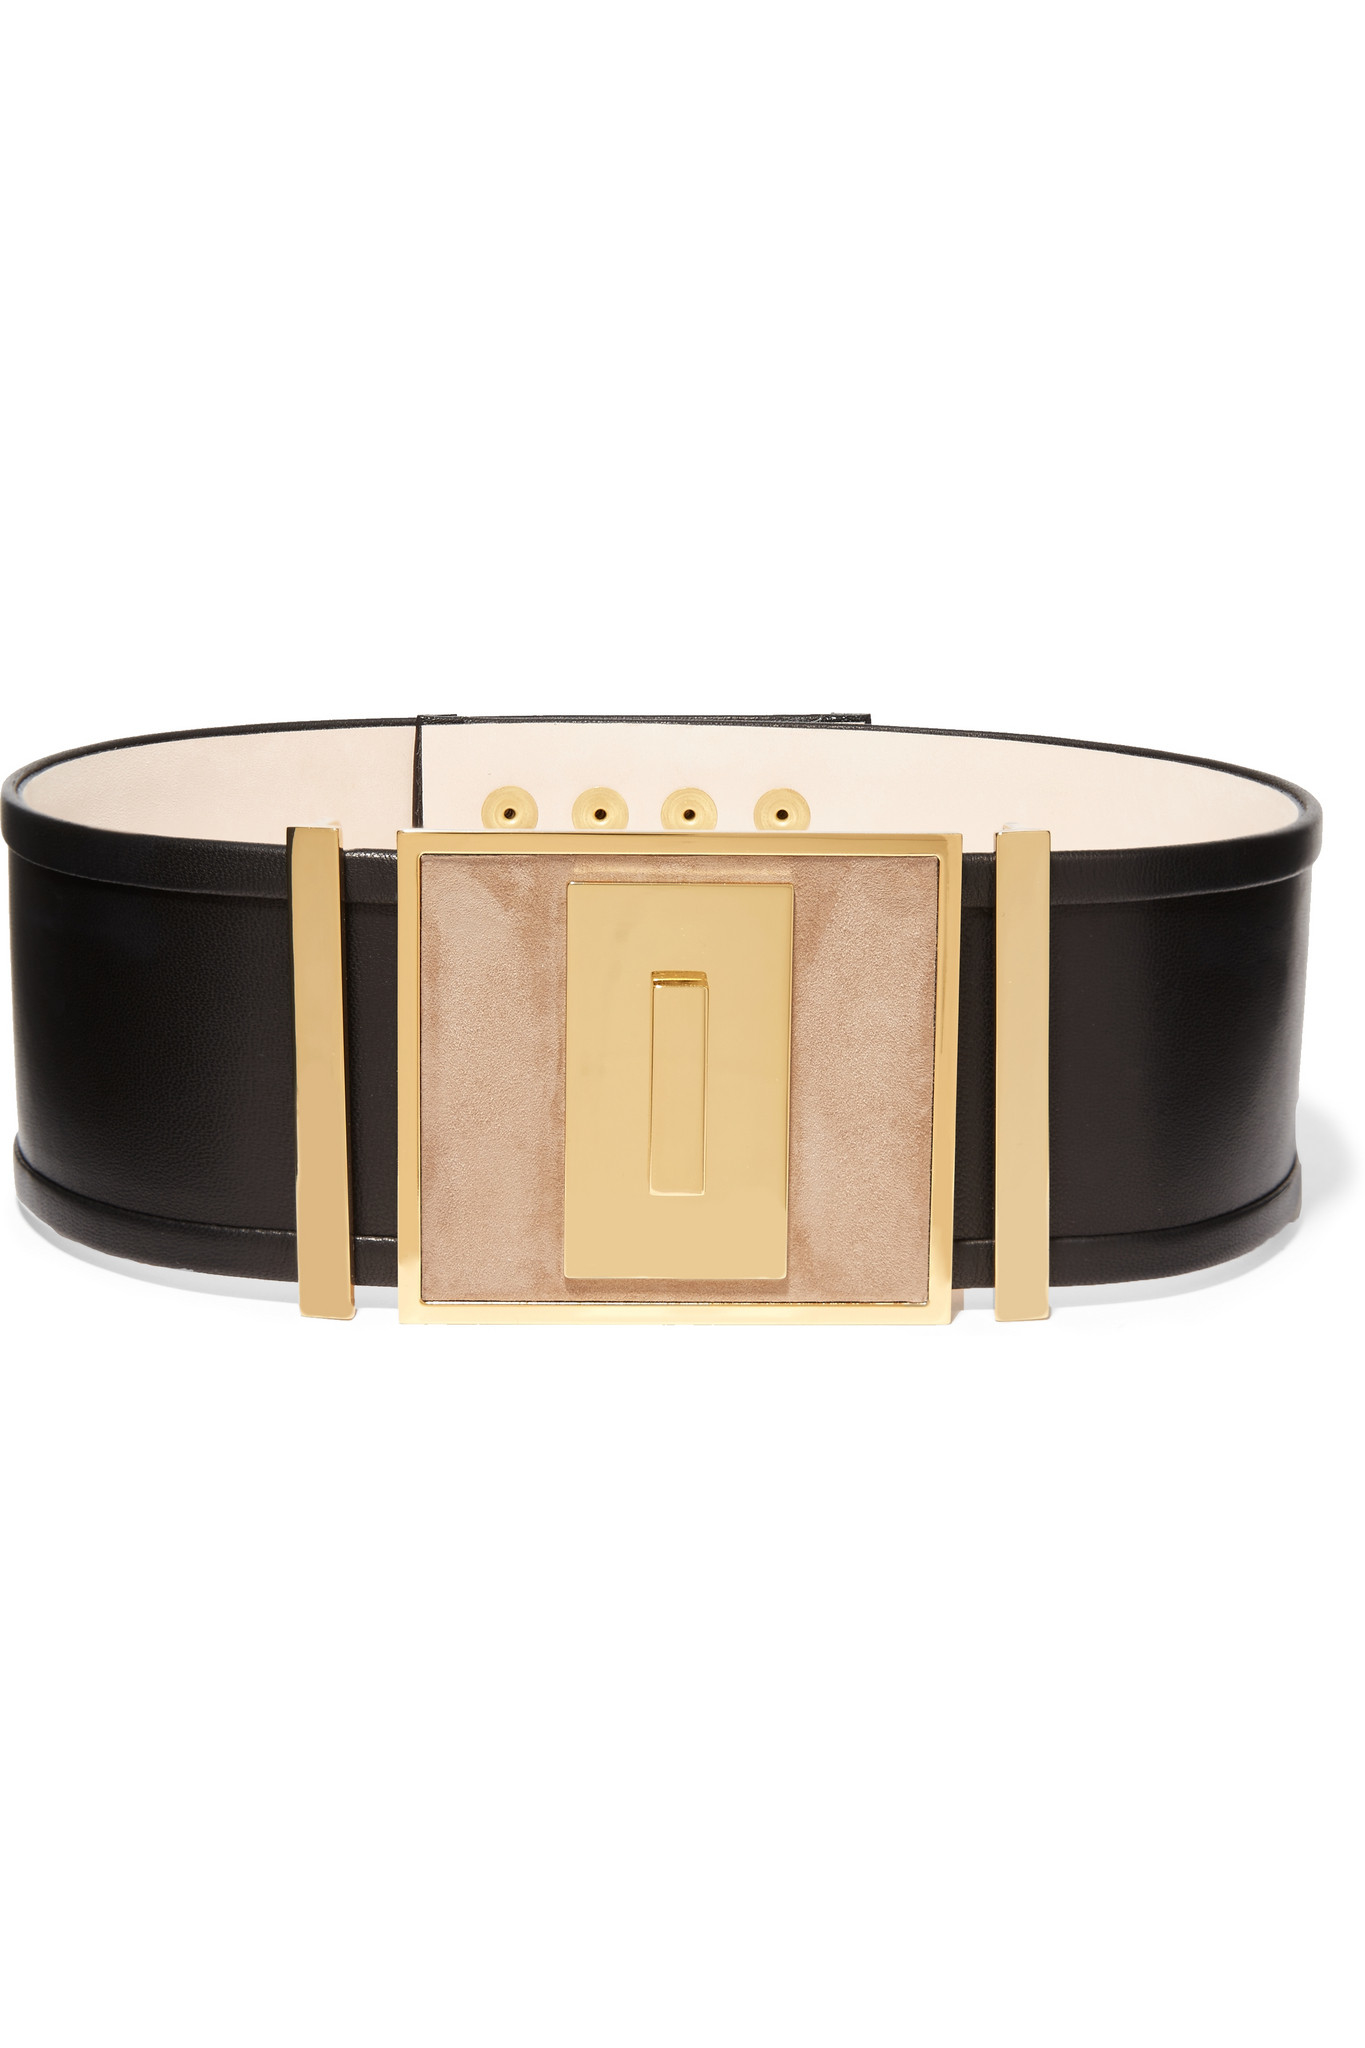 69780bebd3 Balmain Leather And Suede Waist Belt in Black - Lyst